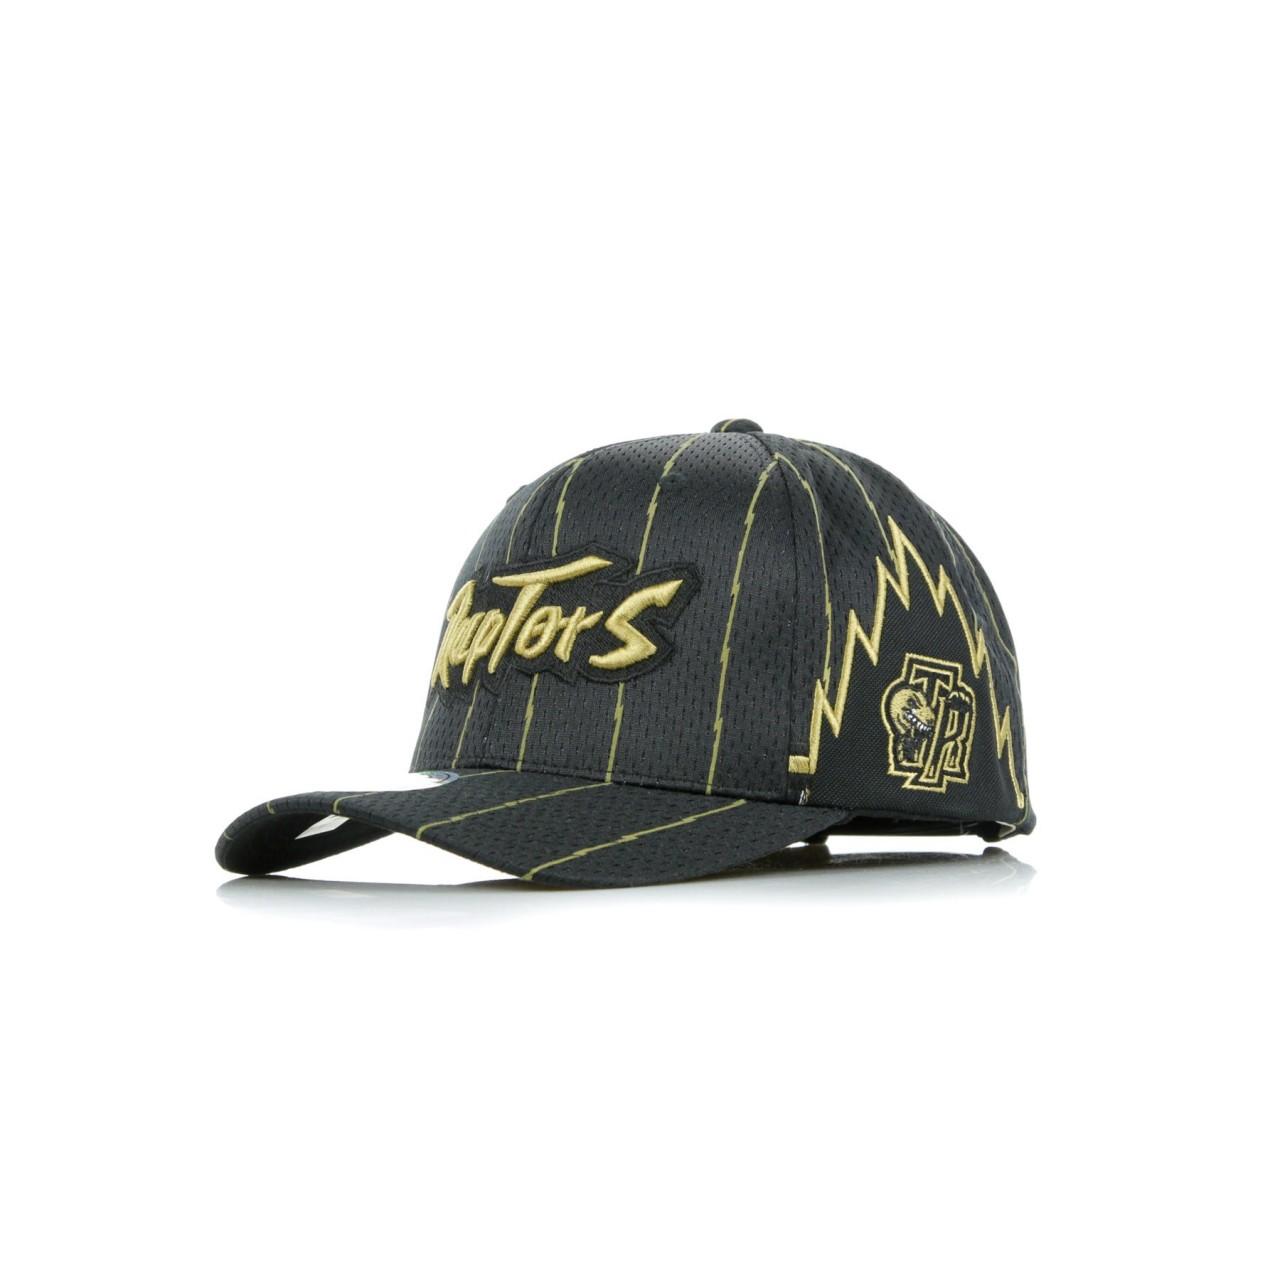 MITCHELL & NESS NBA CITY SERIES SNAPBACK TORRAP MN-HWC-INTL296-TORRAP-BLK